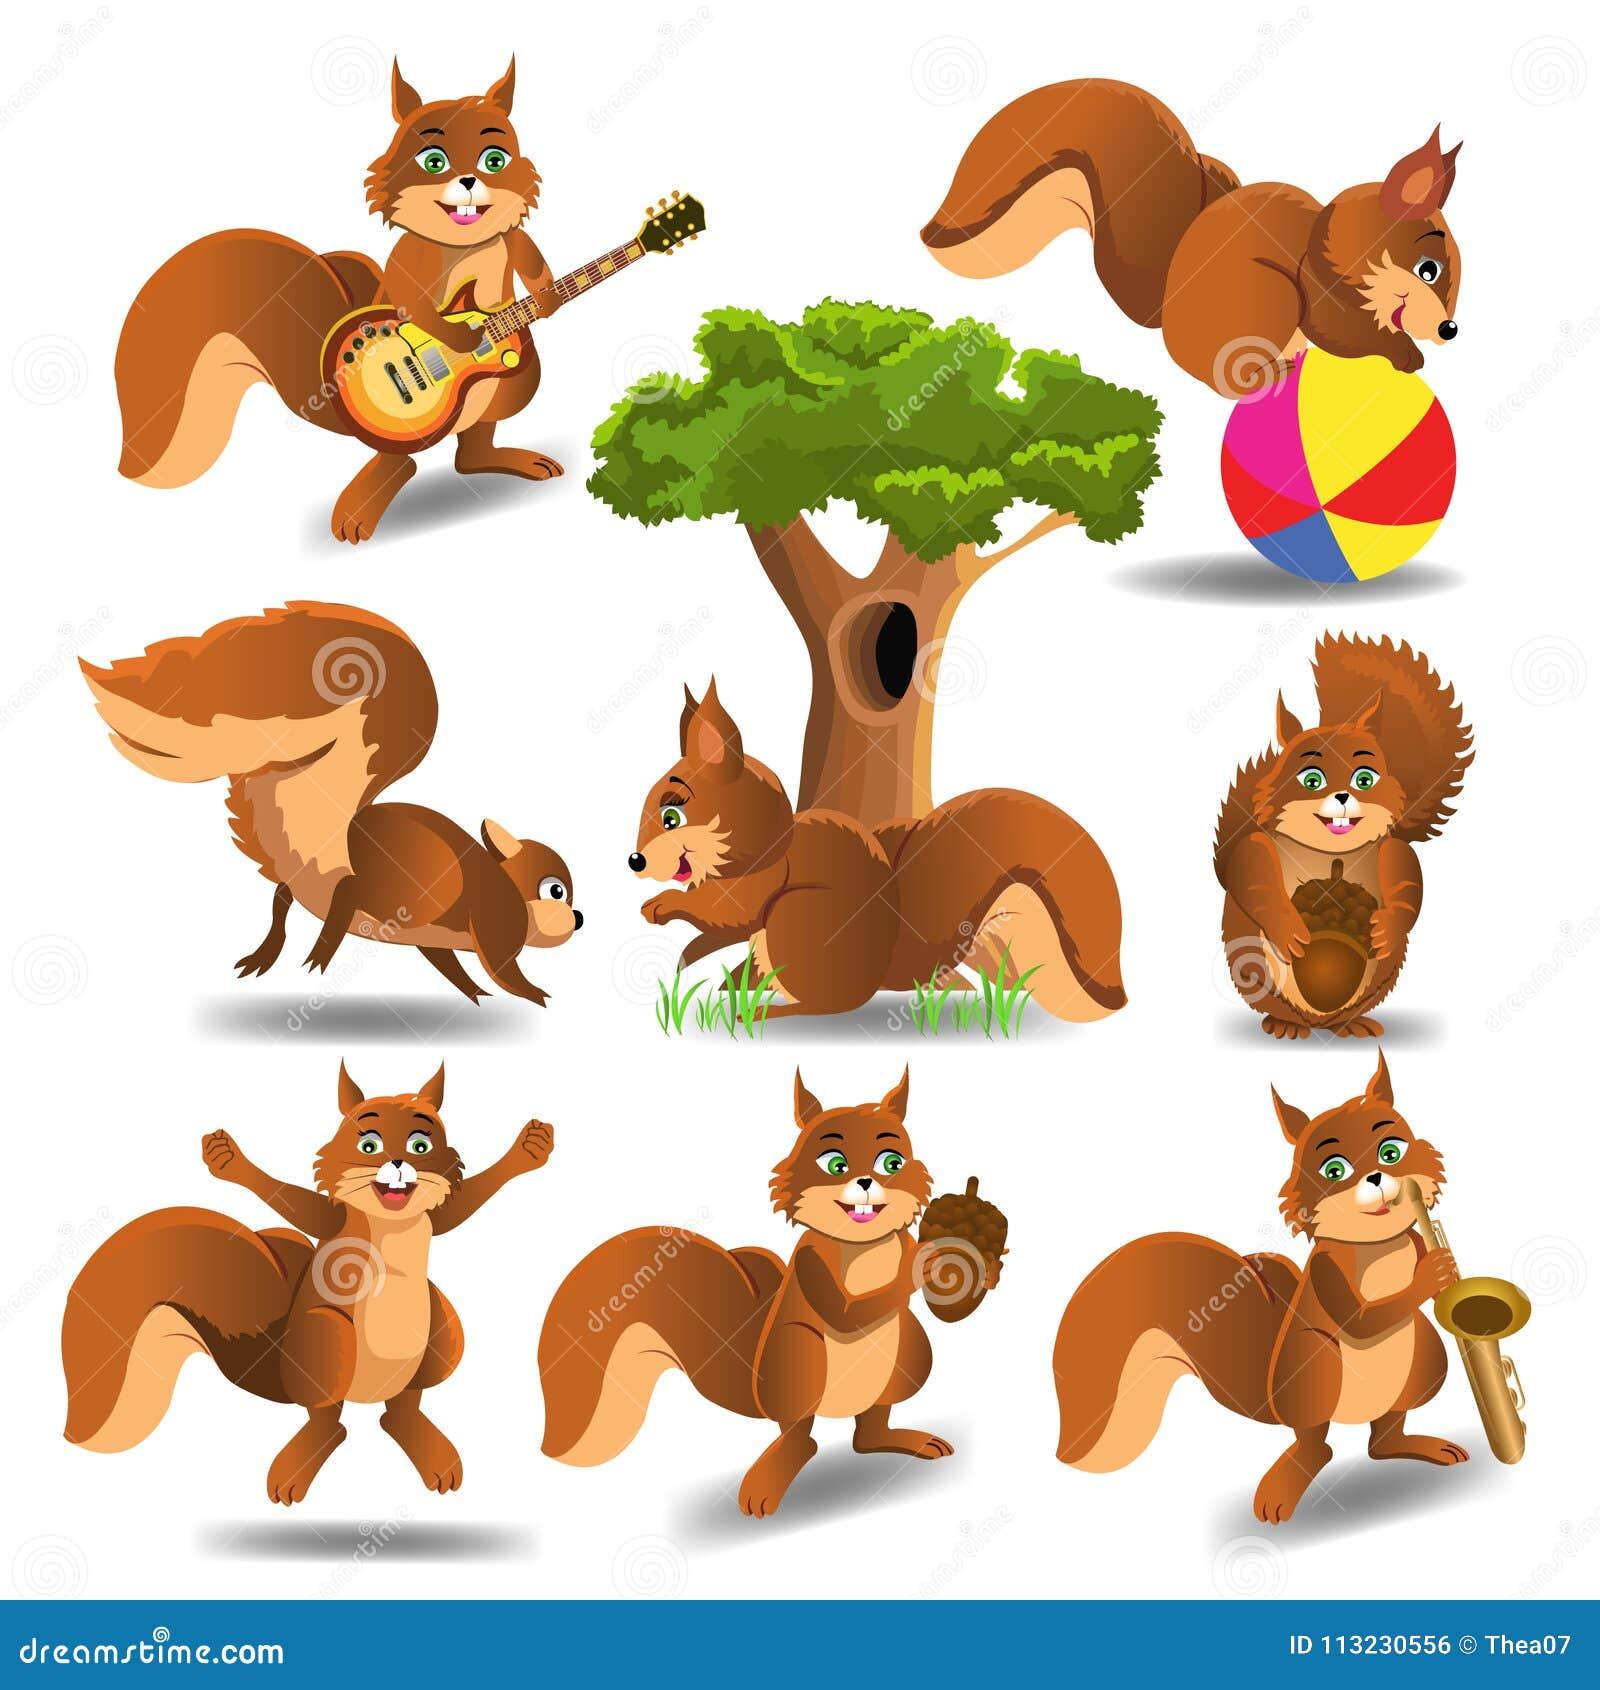 Squirrels Cartoons Illustrations Vector Stock Images